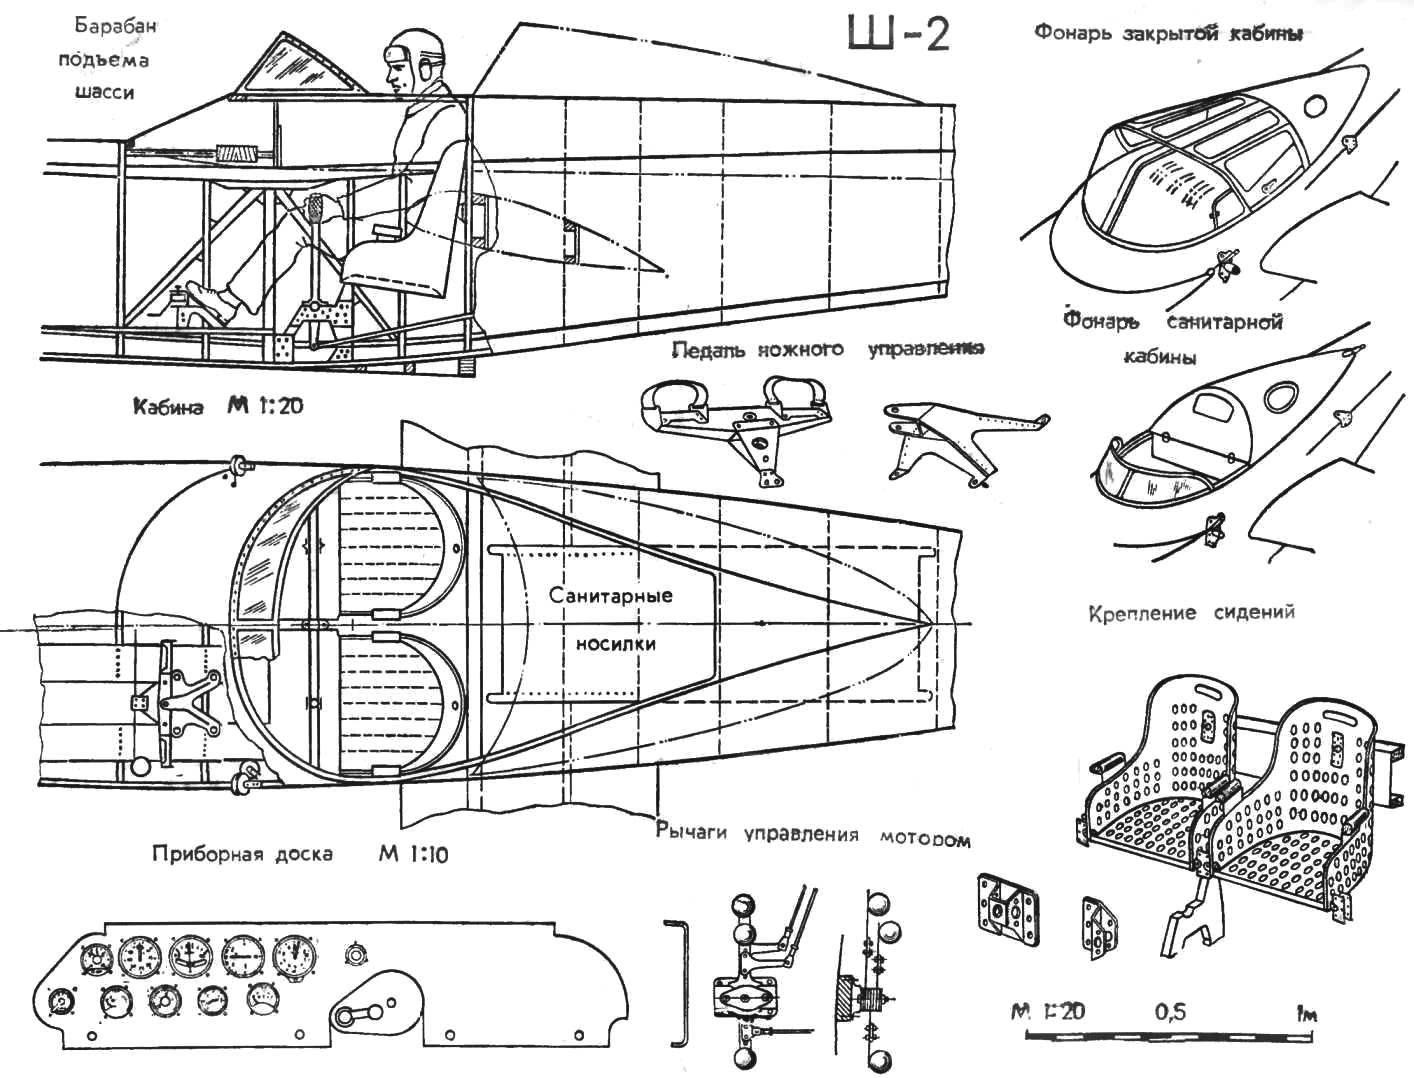 САМОЛЕТ-АМФИБИЯ Ш-2